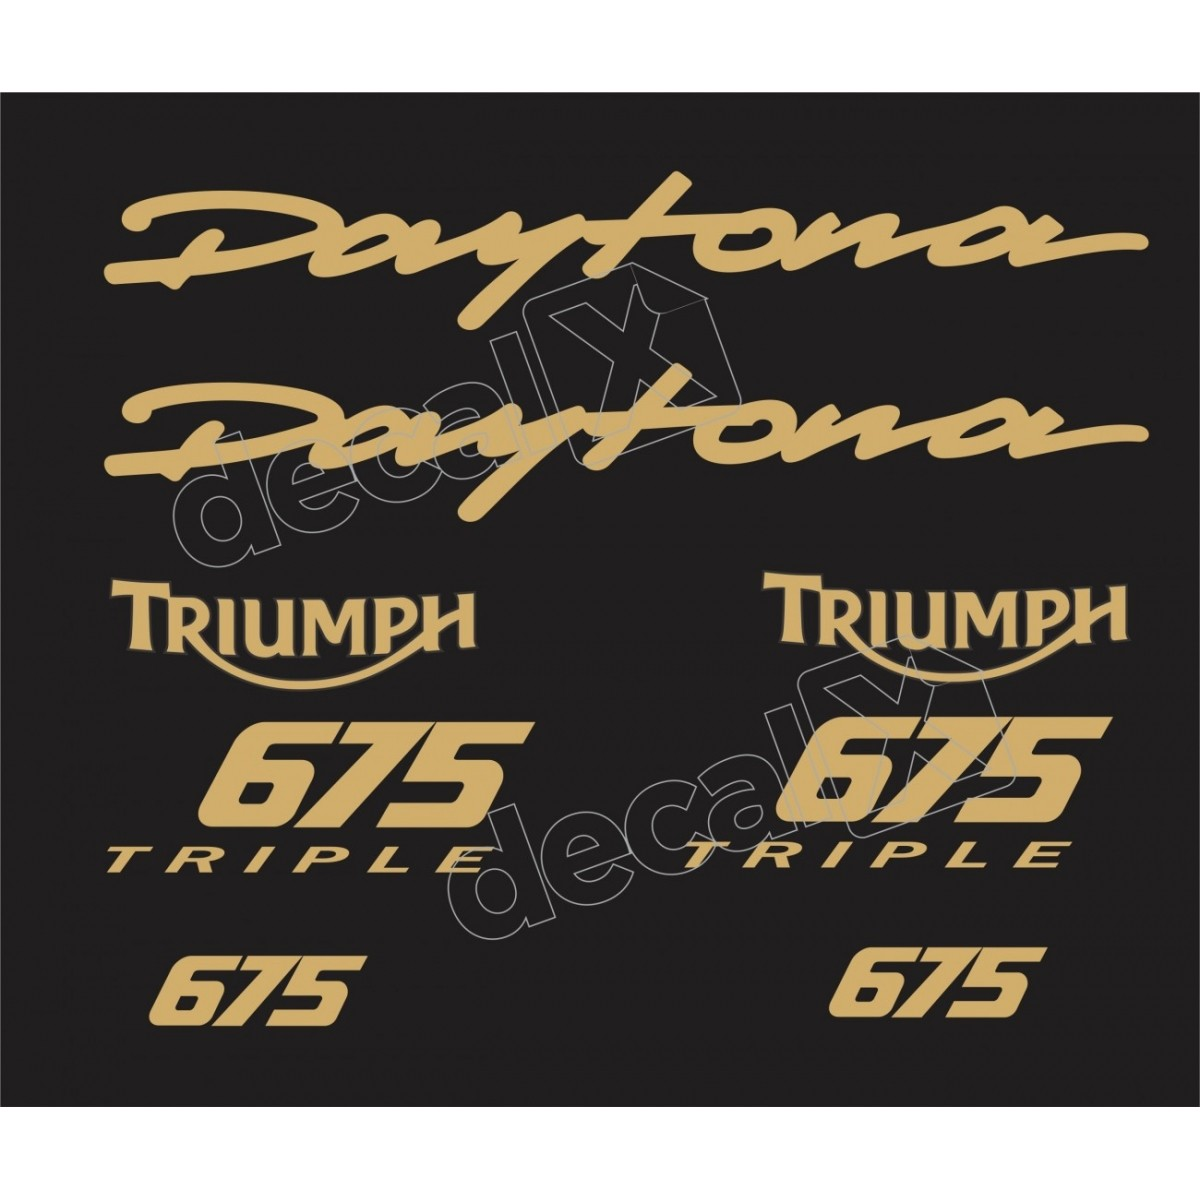 Kit Adesivos Triumph Daytona 675 Preta E Dourado Decalx